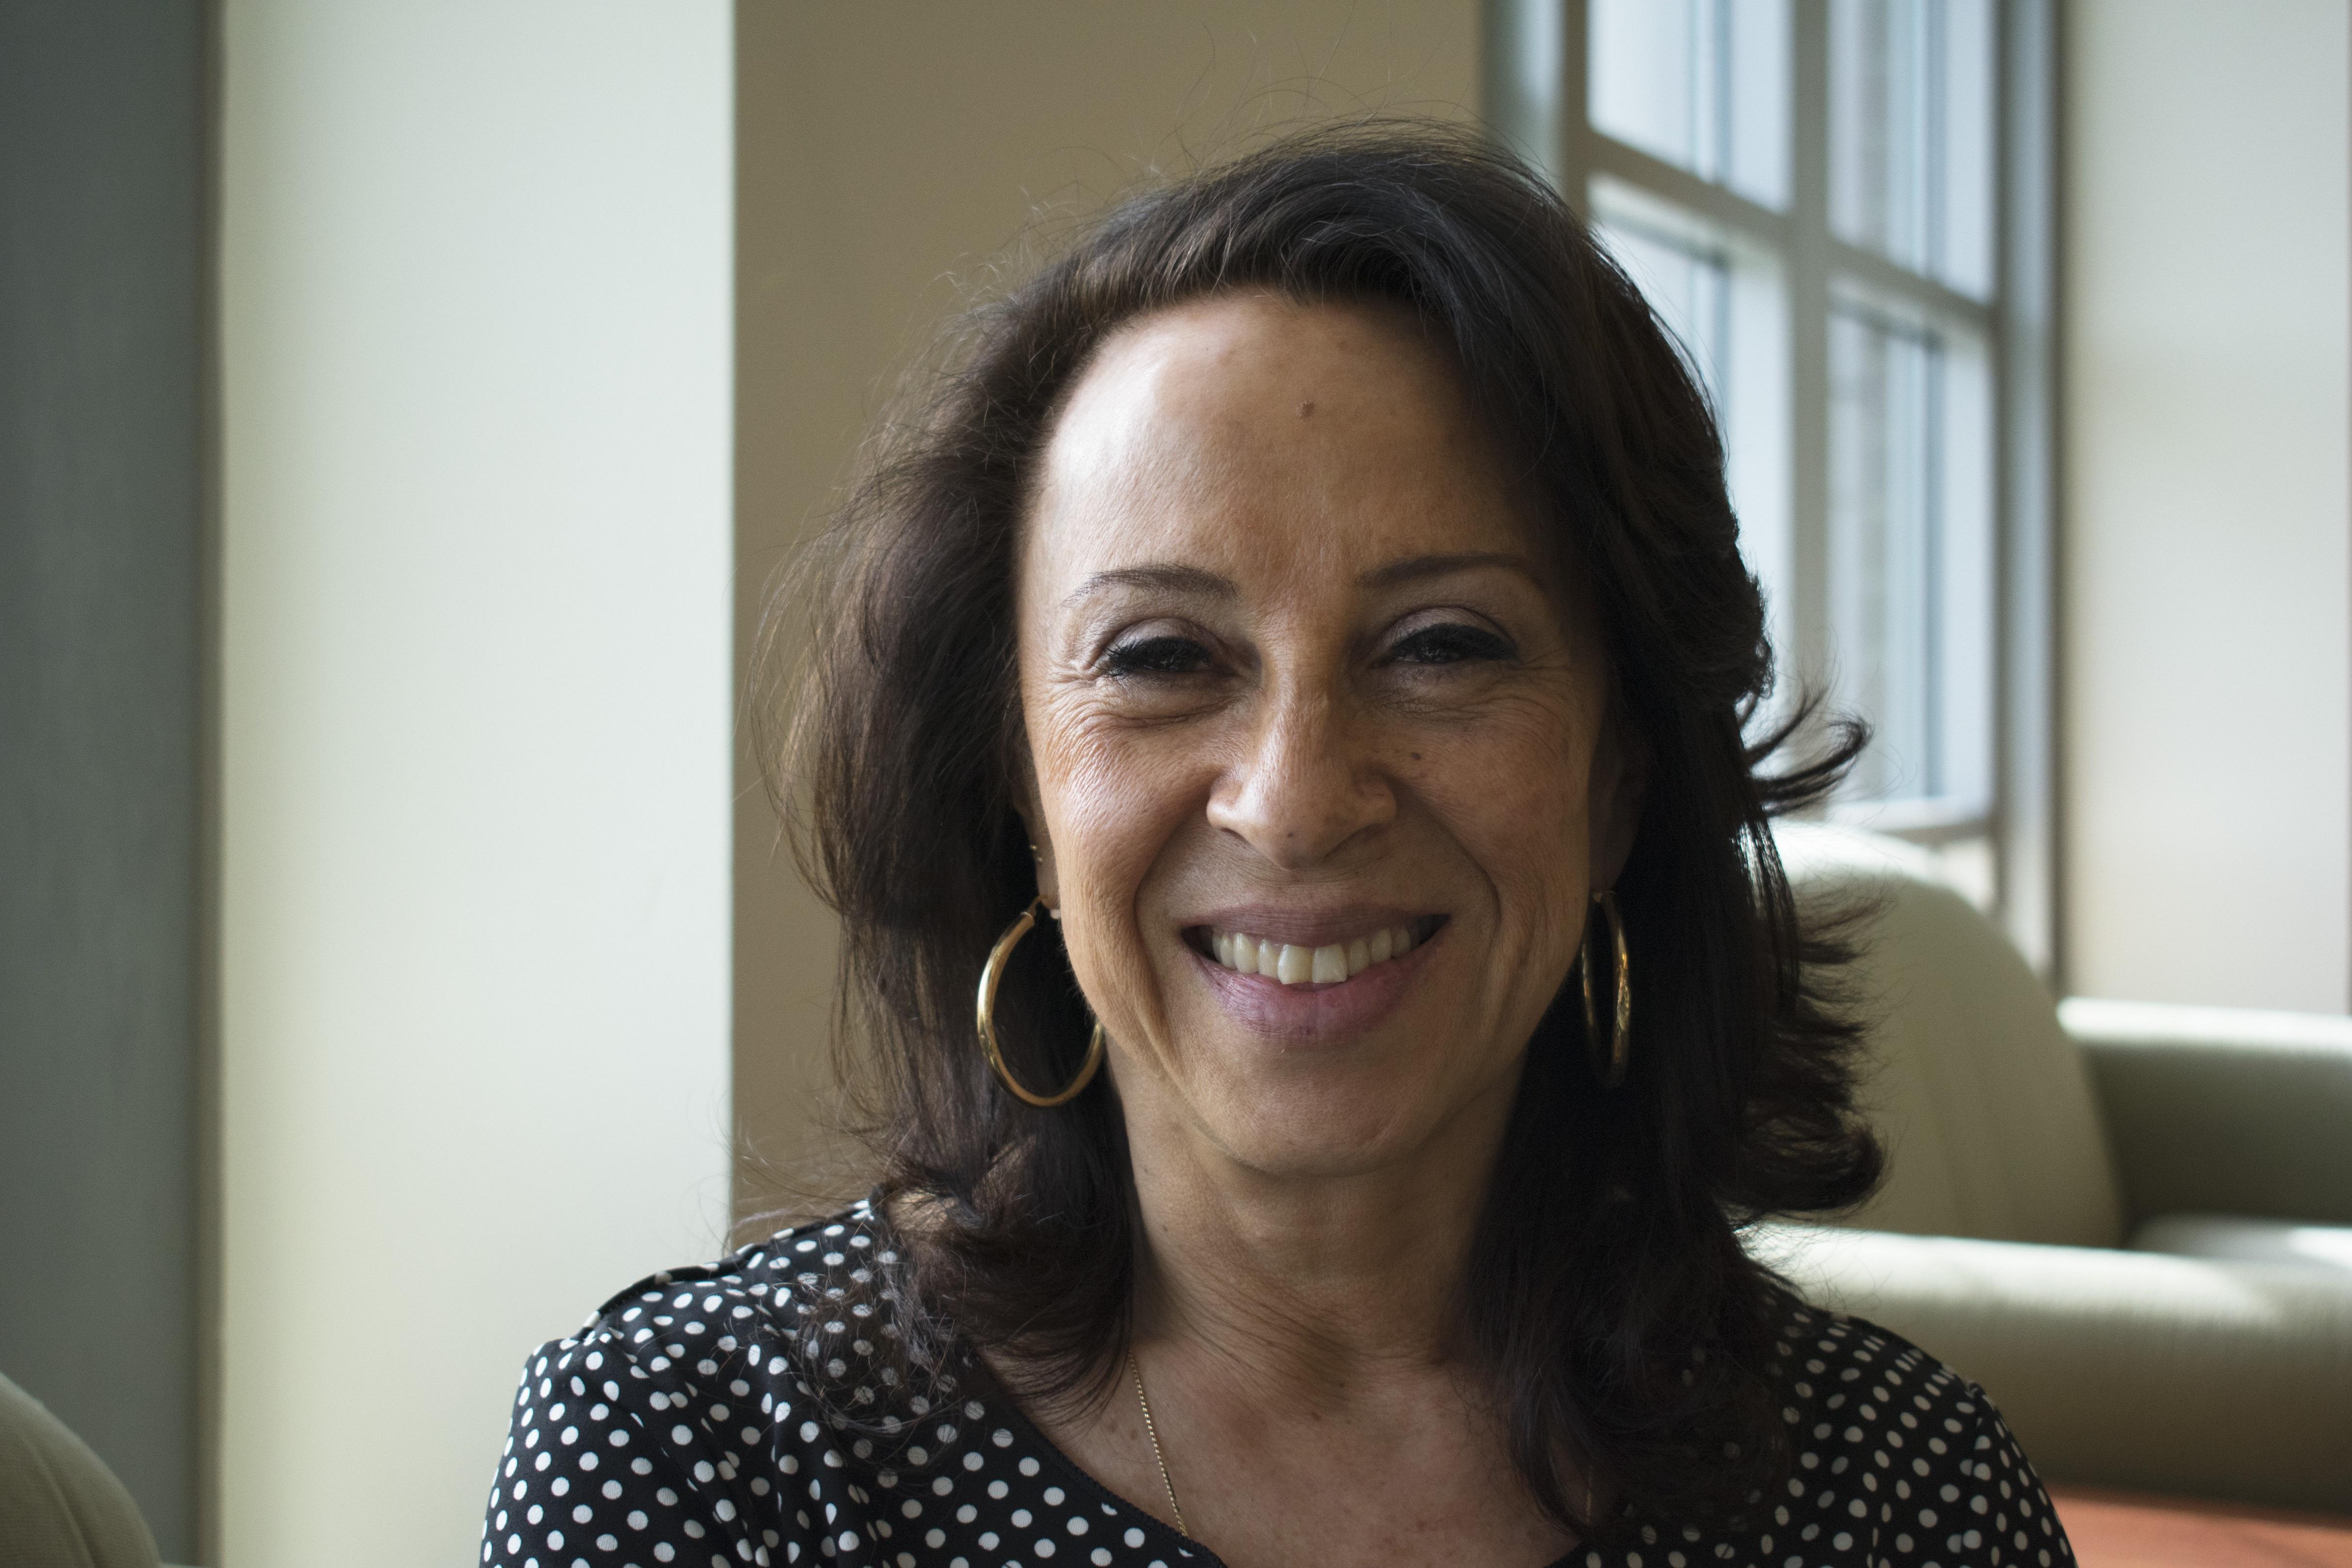 Journalist Maria Hinojosa, host and managing editor of the NPR program Latino USA. CREDIT: Natalie Van Hoozer